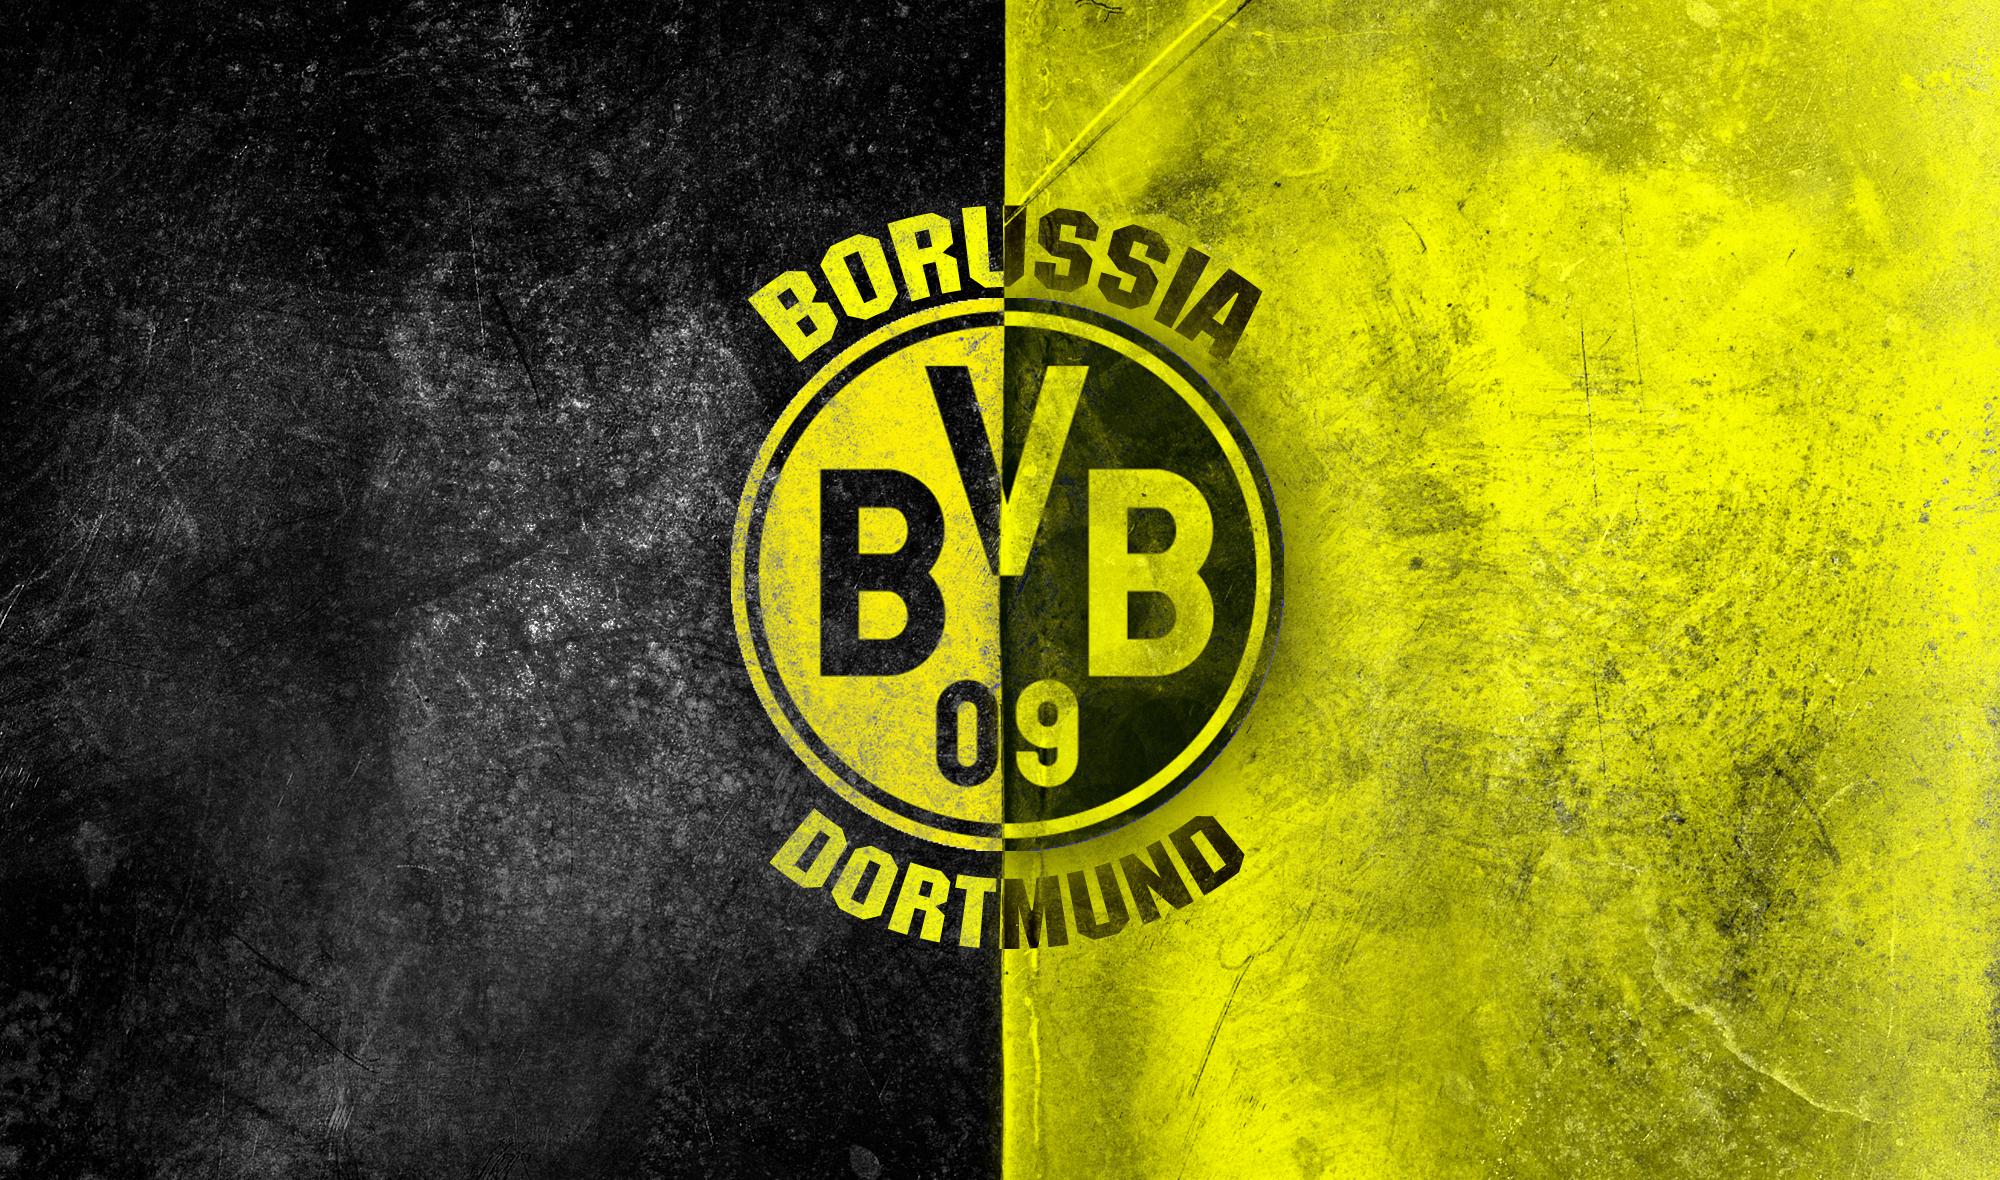 Borussia Dortmund Symbol Wallpaper